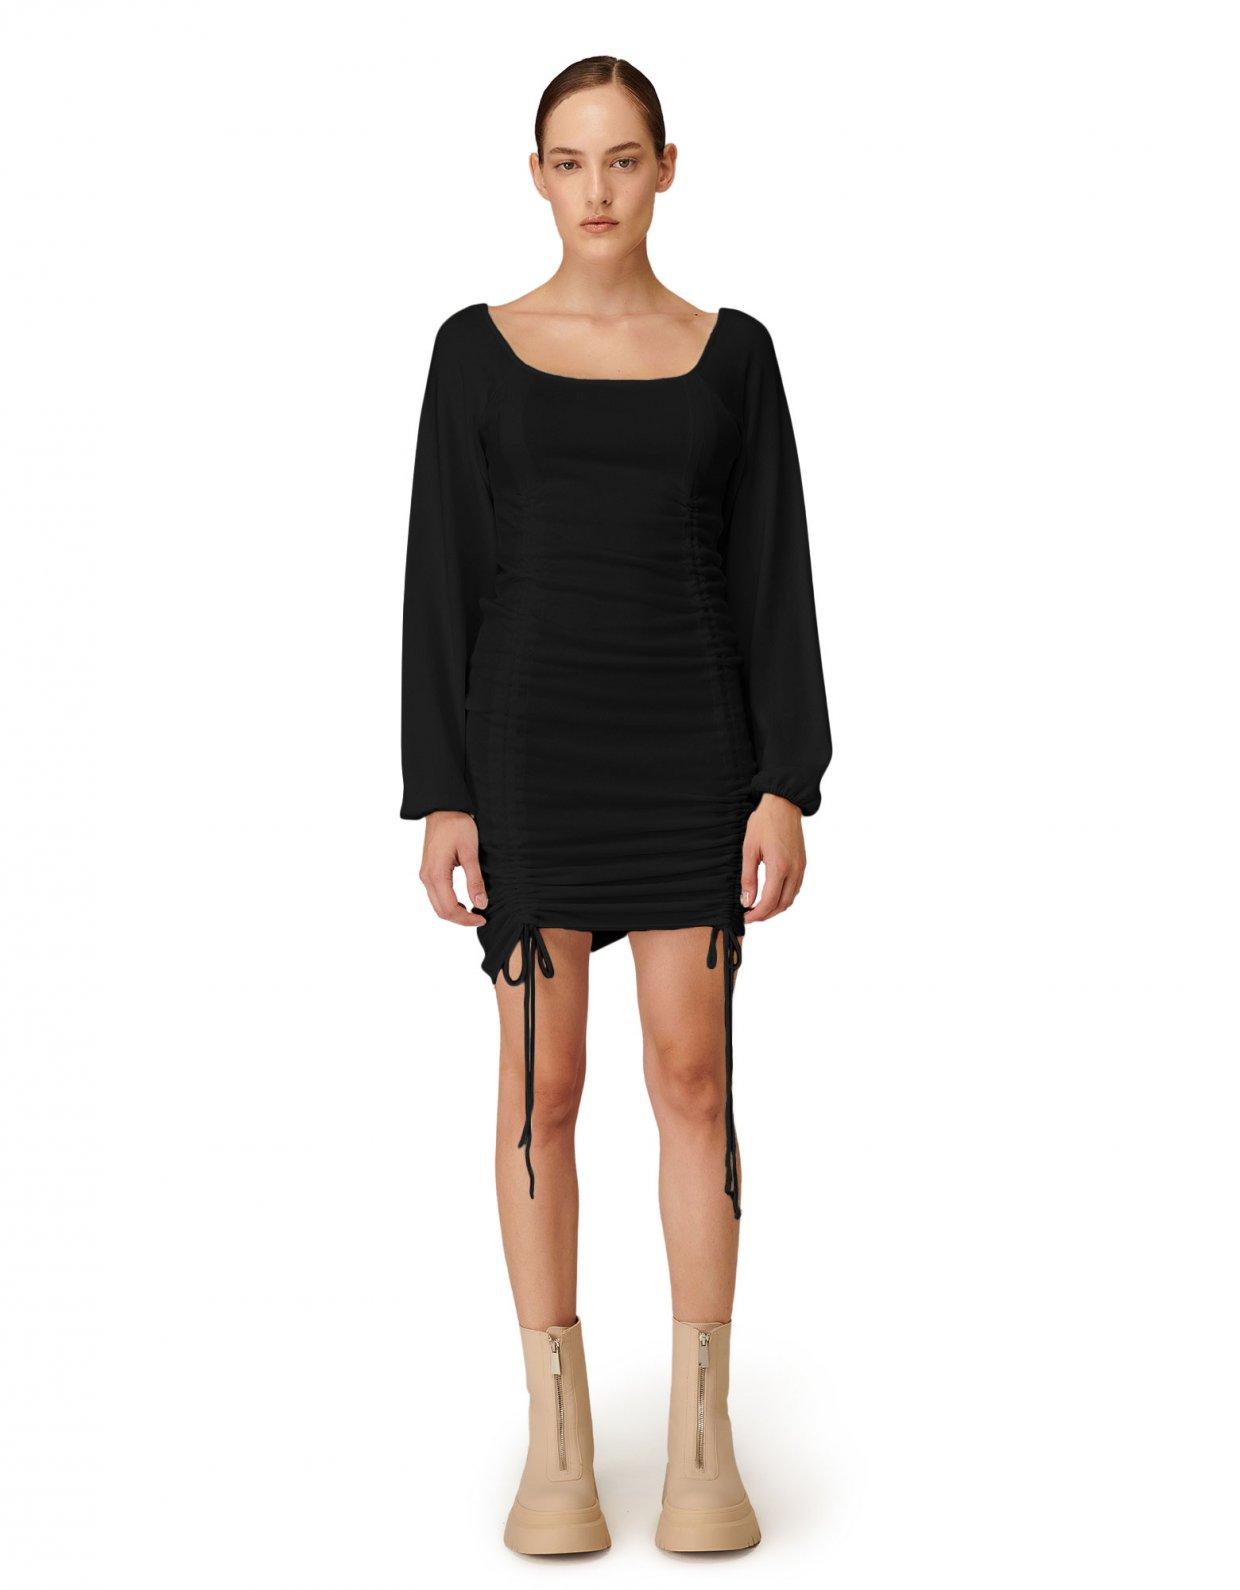 Combos Knitwear Combos W-115 Black dress